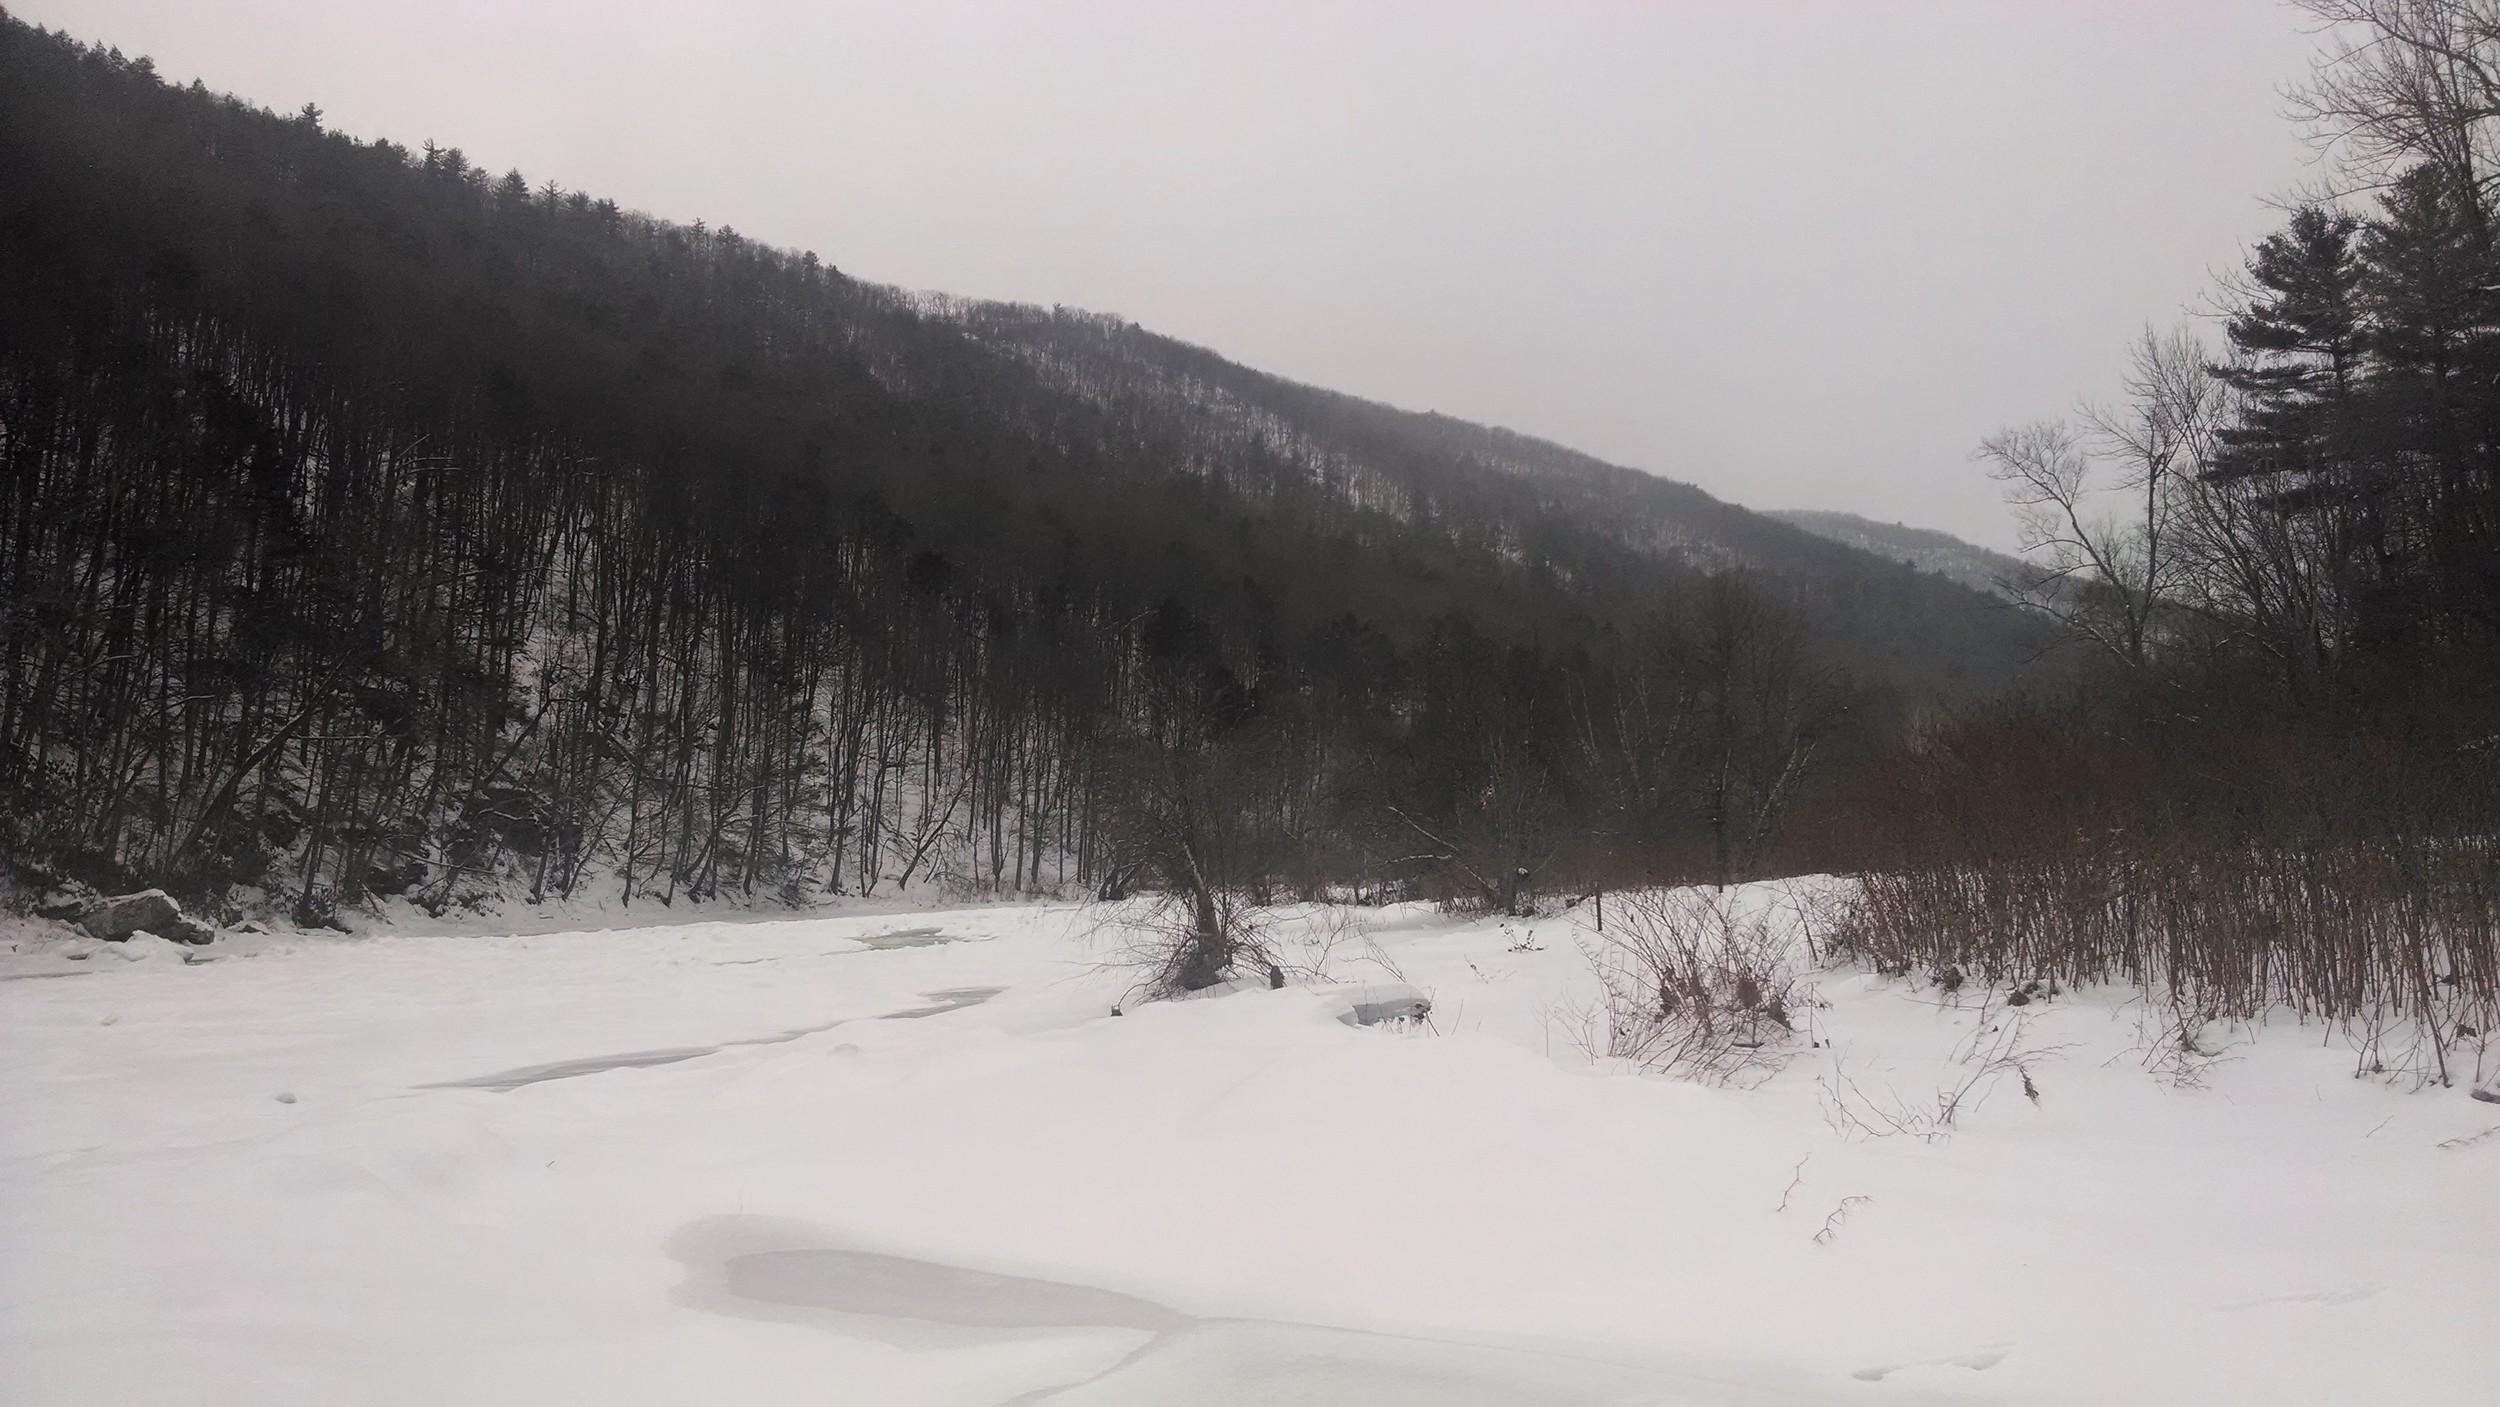 Ramsey Village access area 2-8-14. Pine Creek frozen over.